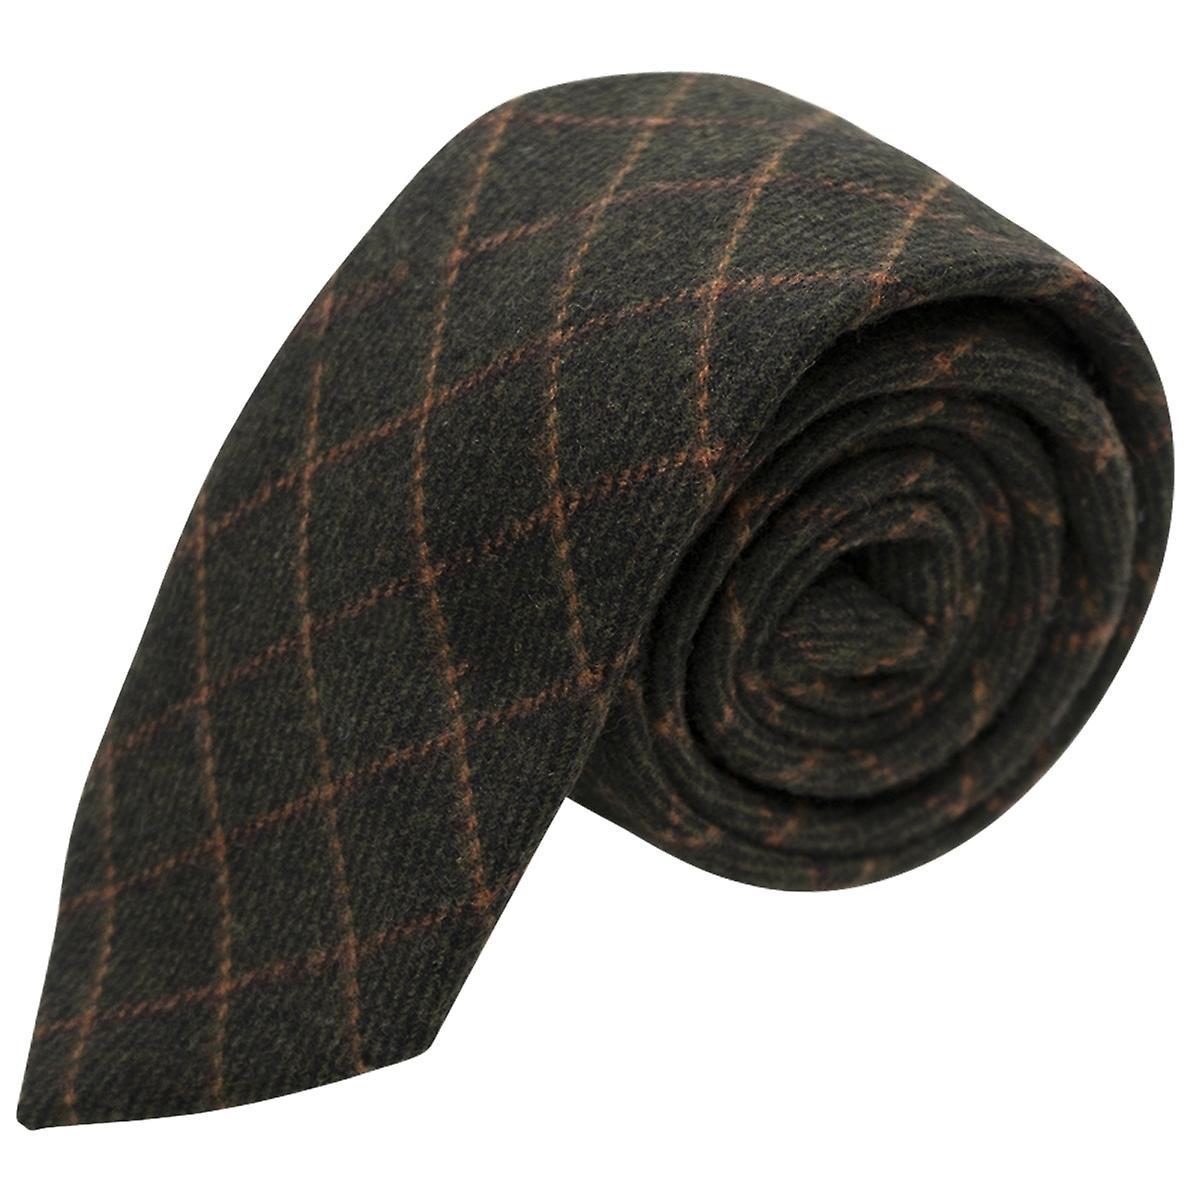 Luxury Leaf Green Tattersall Check Tweed Tie